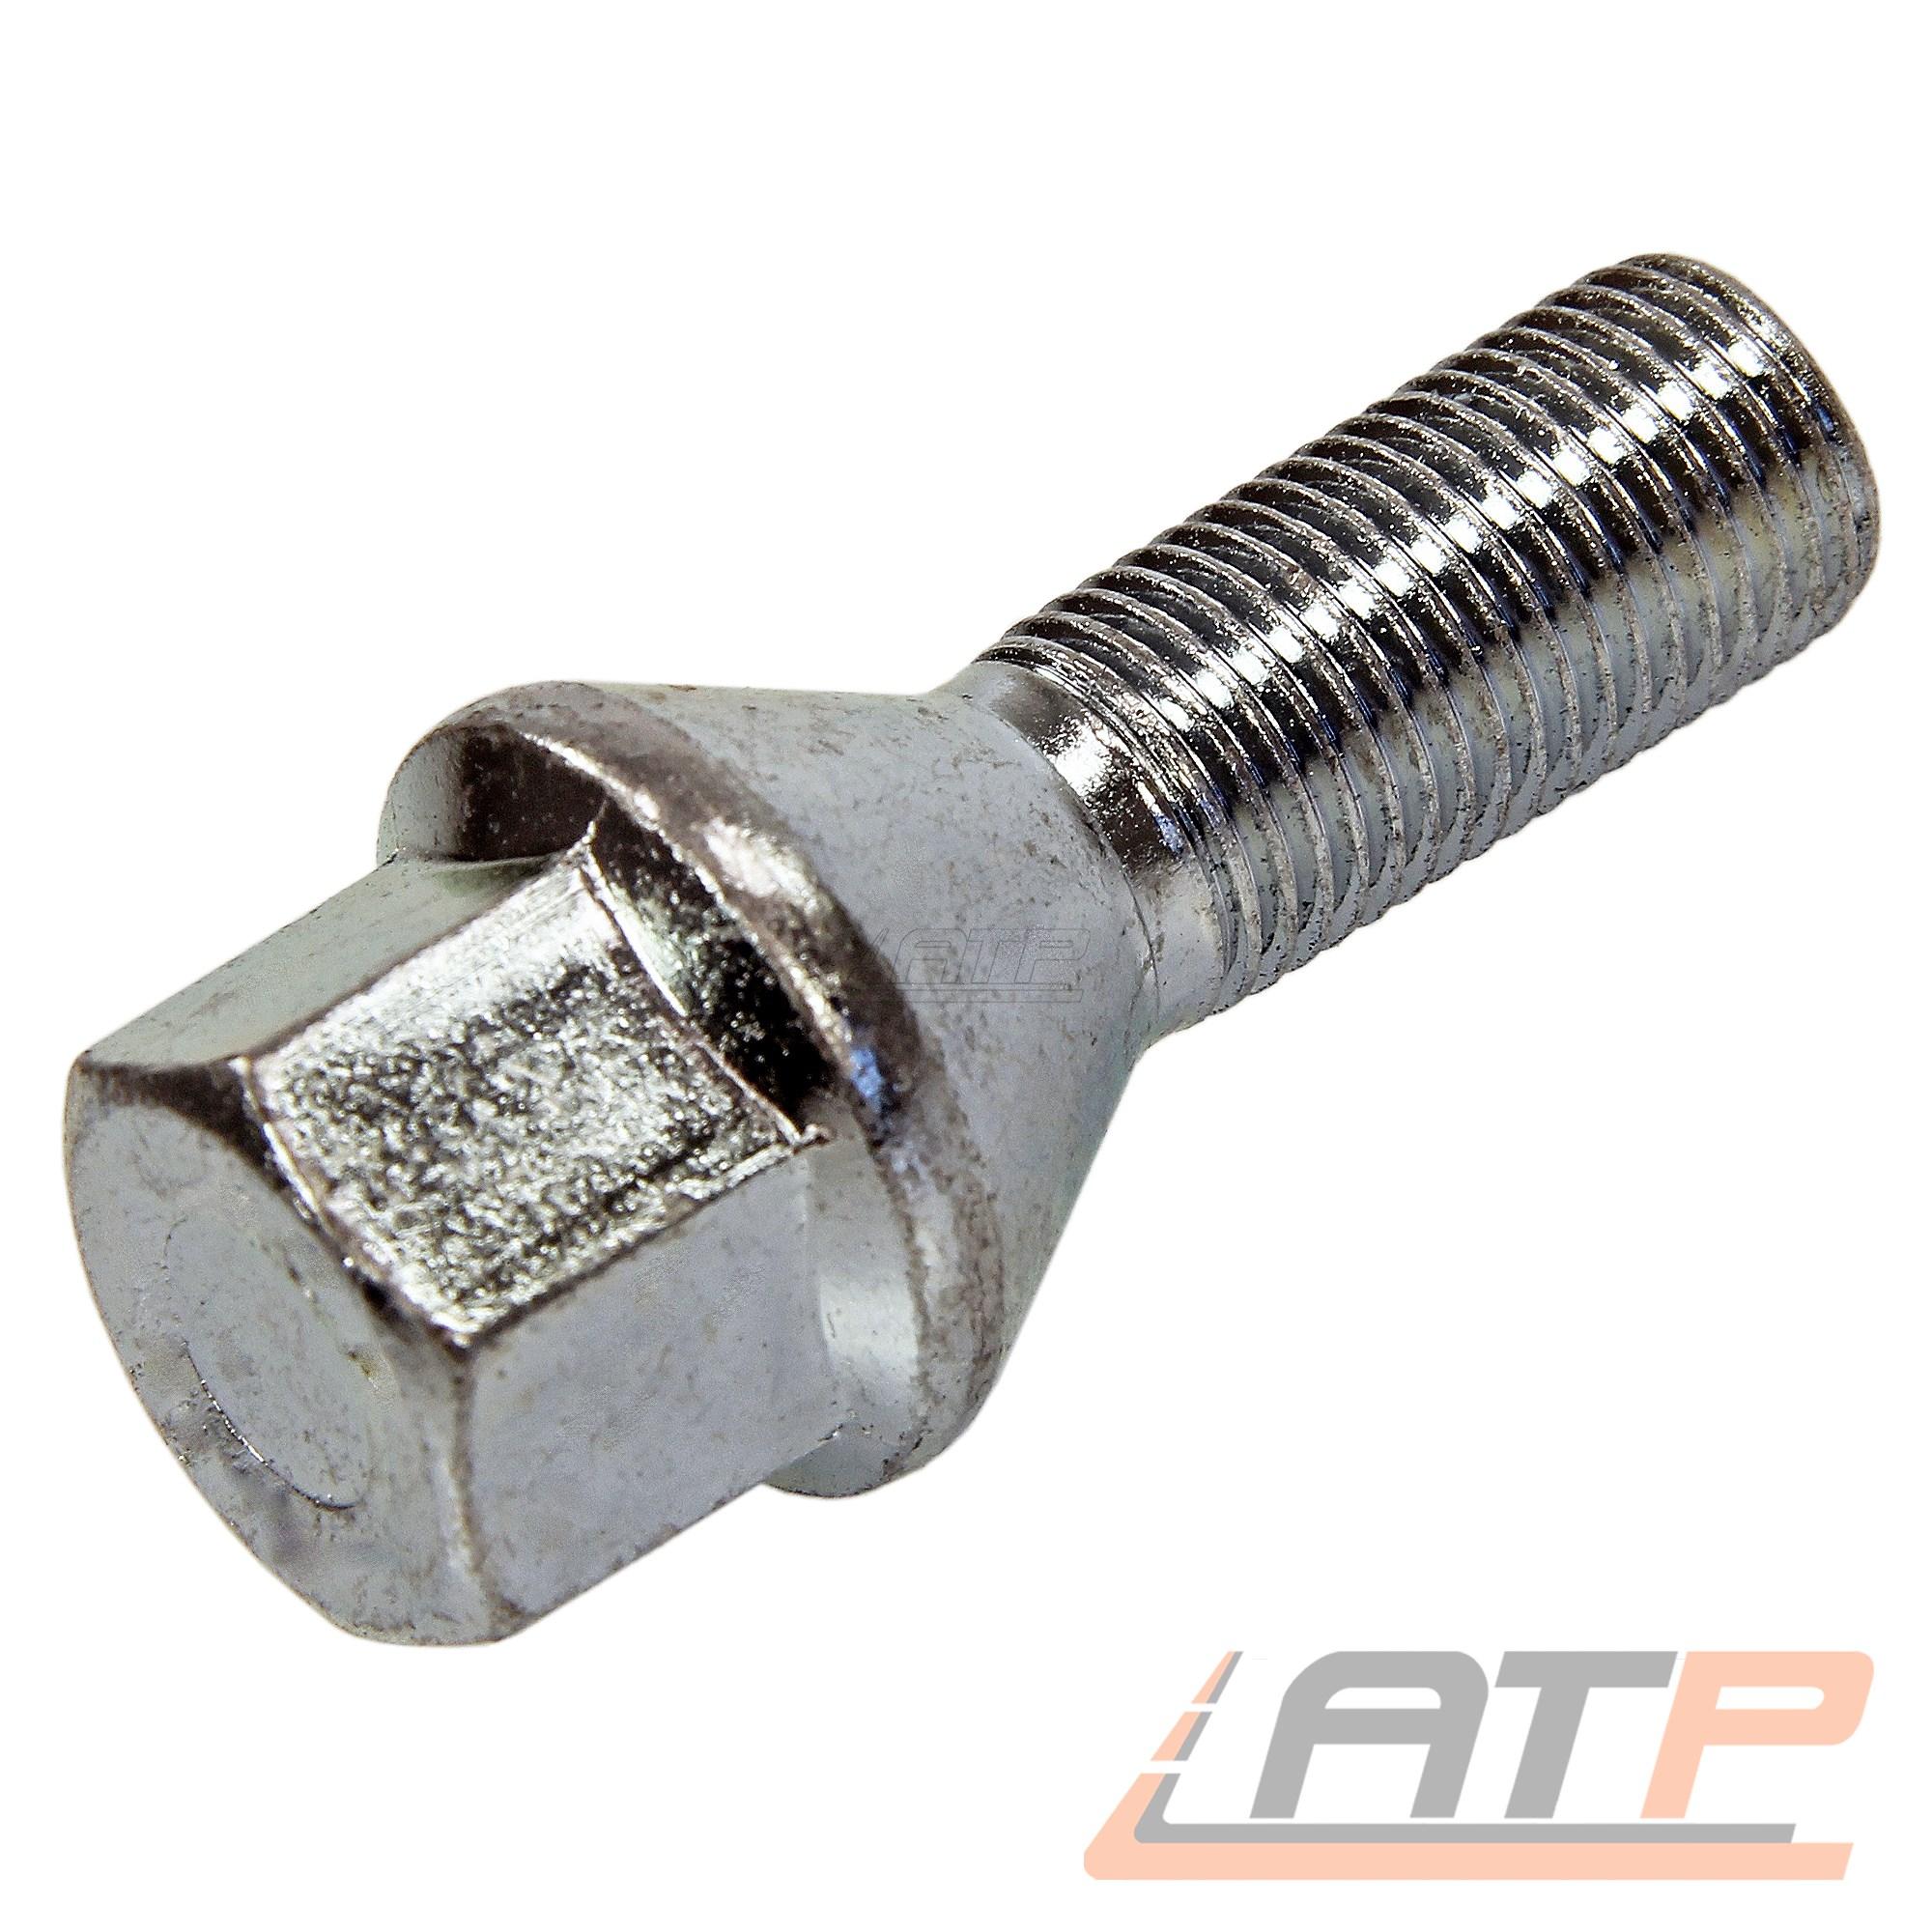 Perno de rueda 16x m12 x 1,5 x 40 mm kegelbund 60 ° sw17 tornillos kegelschraube